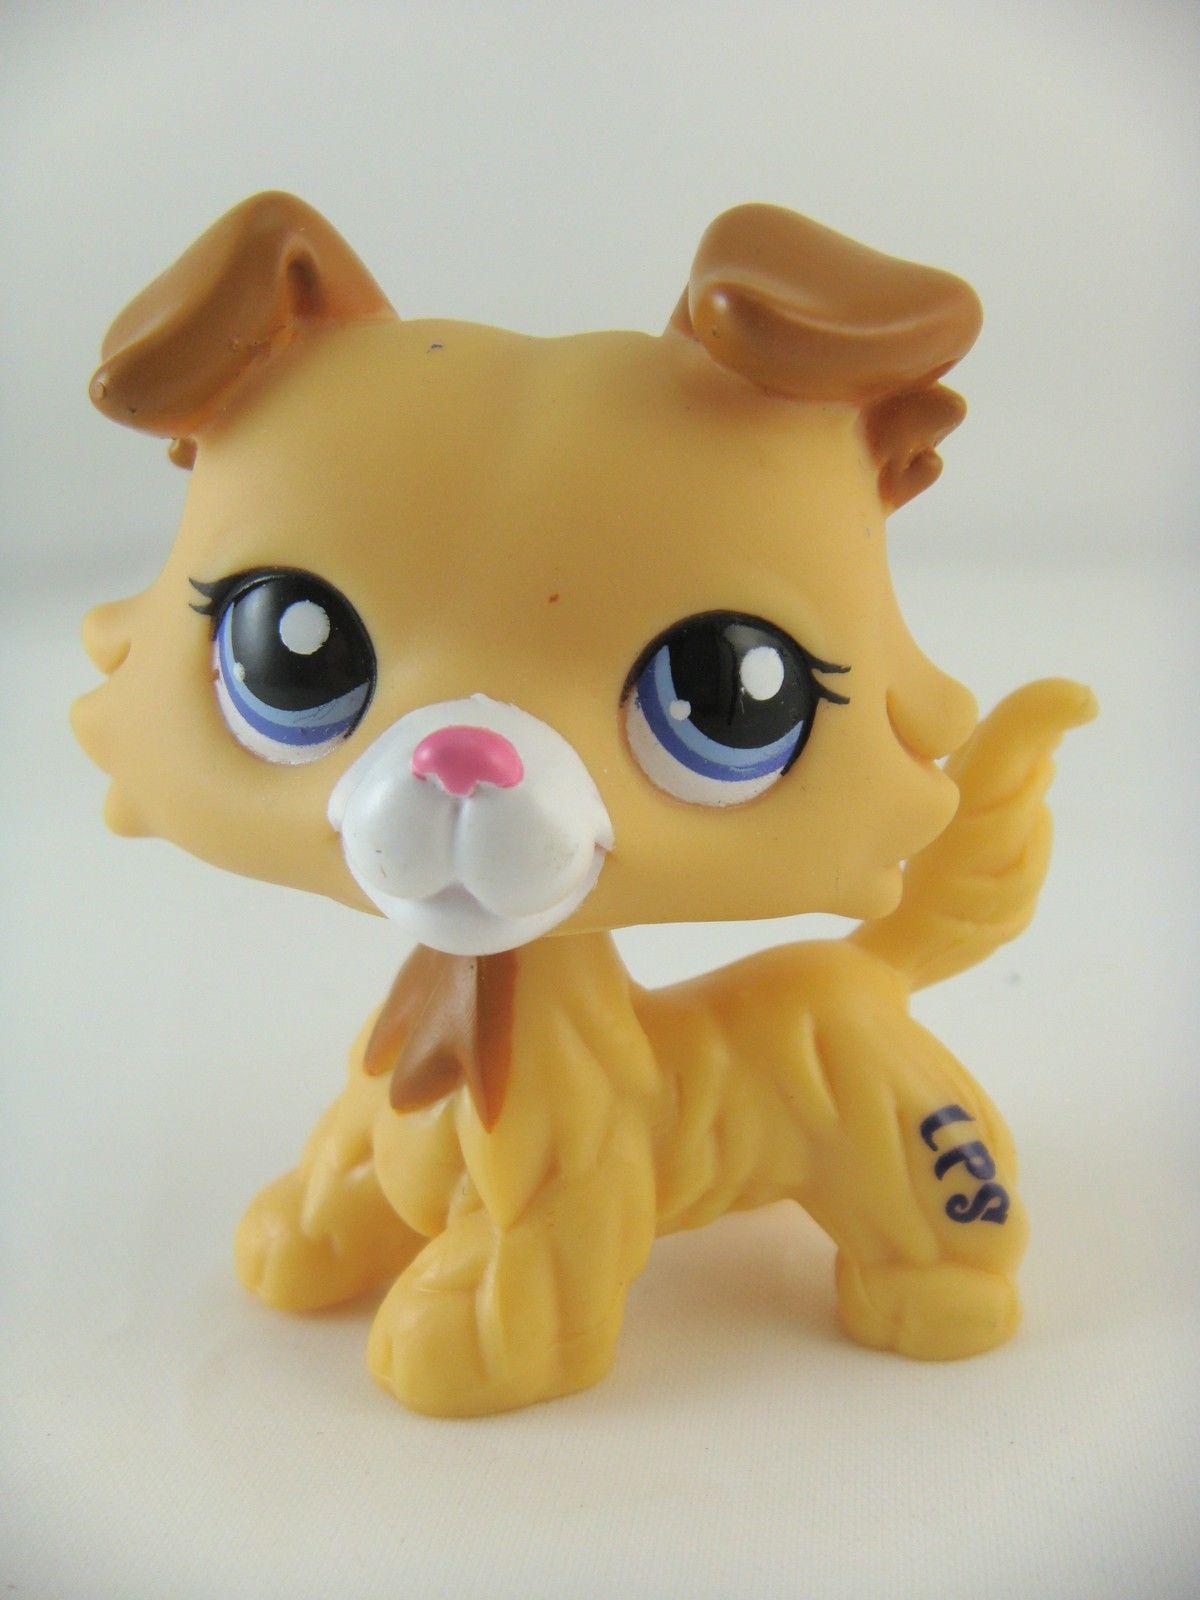 97 77 Rare Collie Blind Bag 2452 Cream Yellow Puppy Dog Ebay